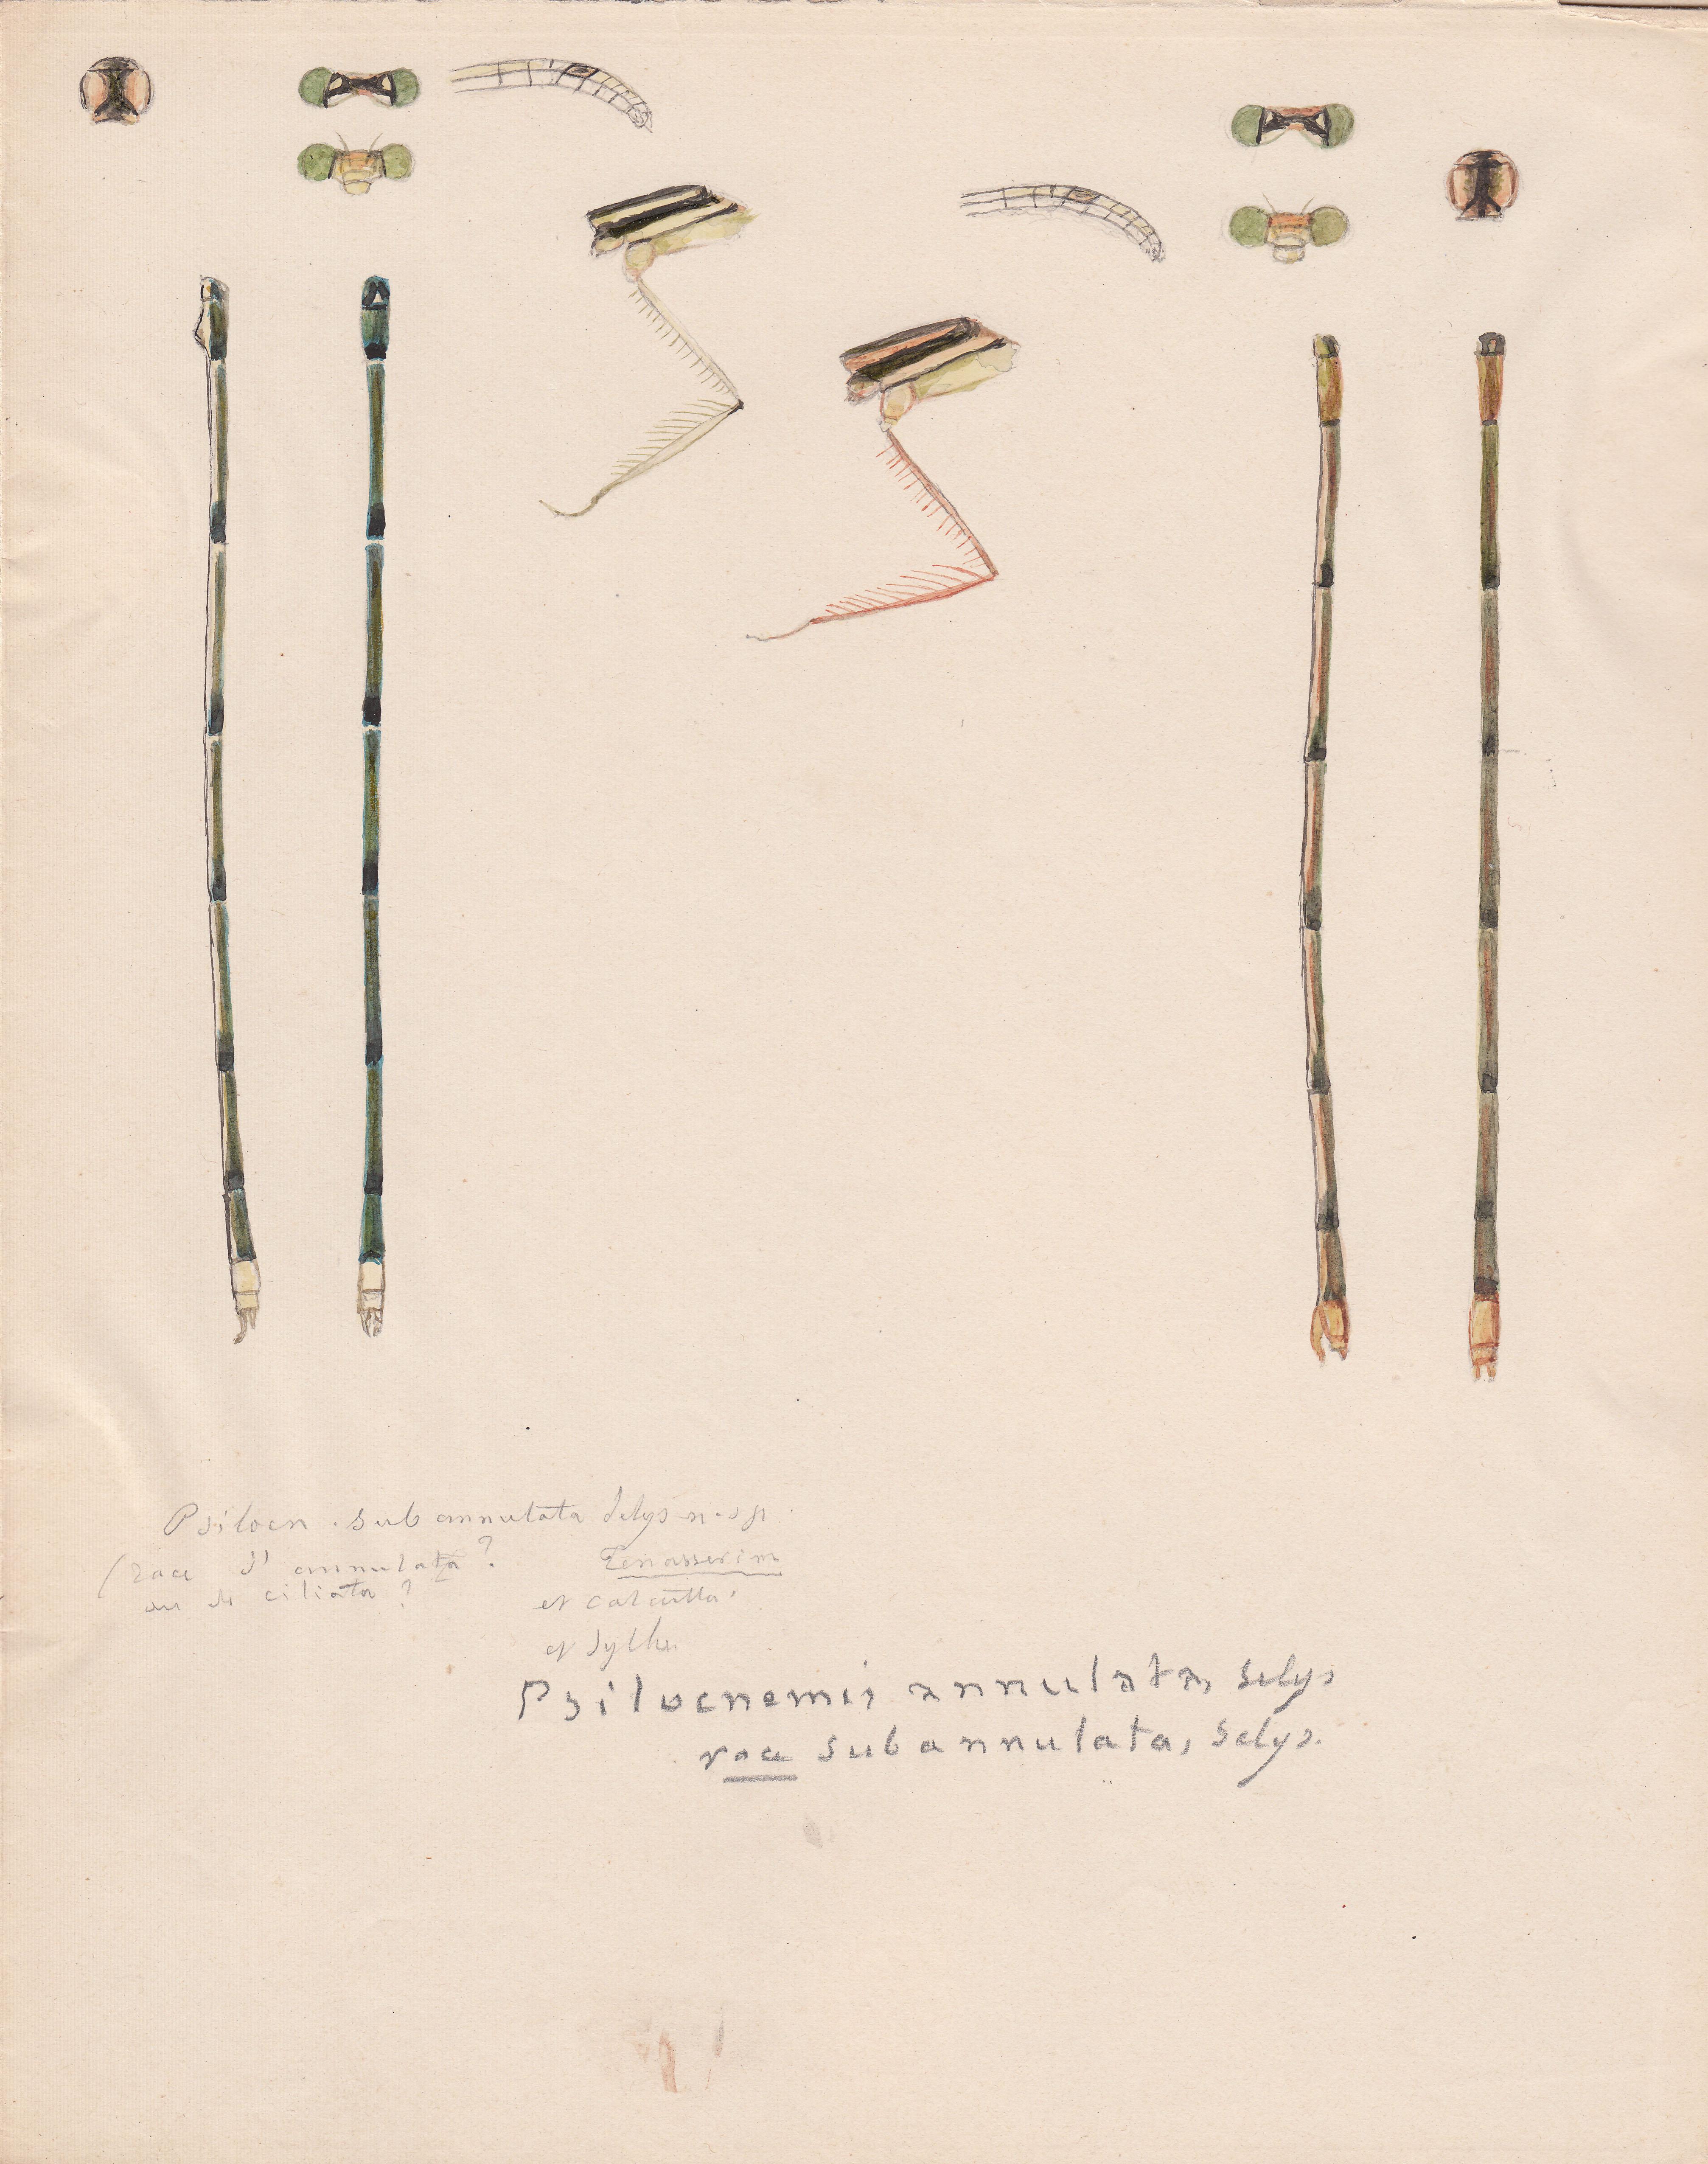 Psilocnemis annulata variety subannulata.jpg